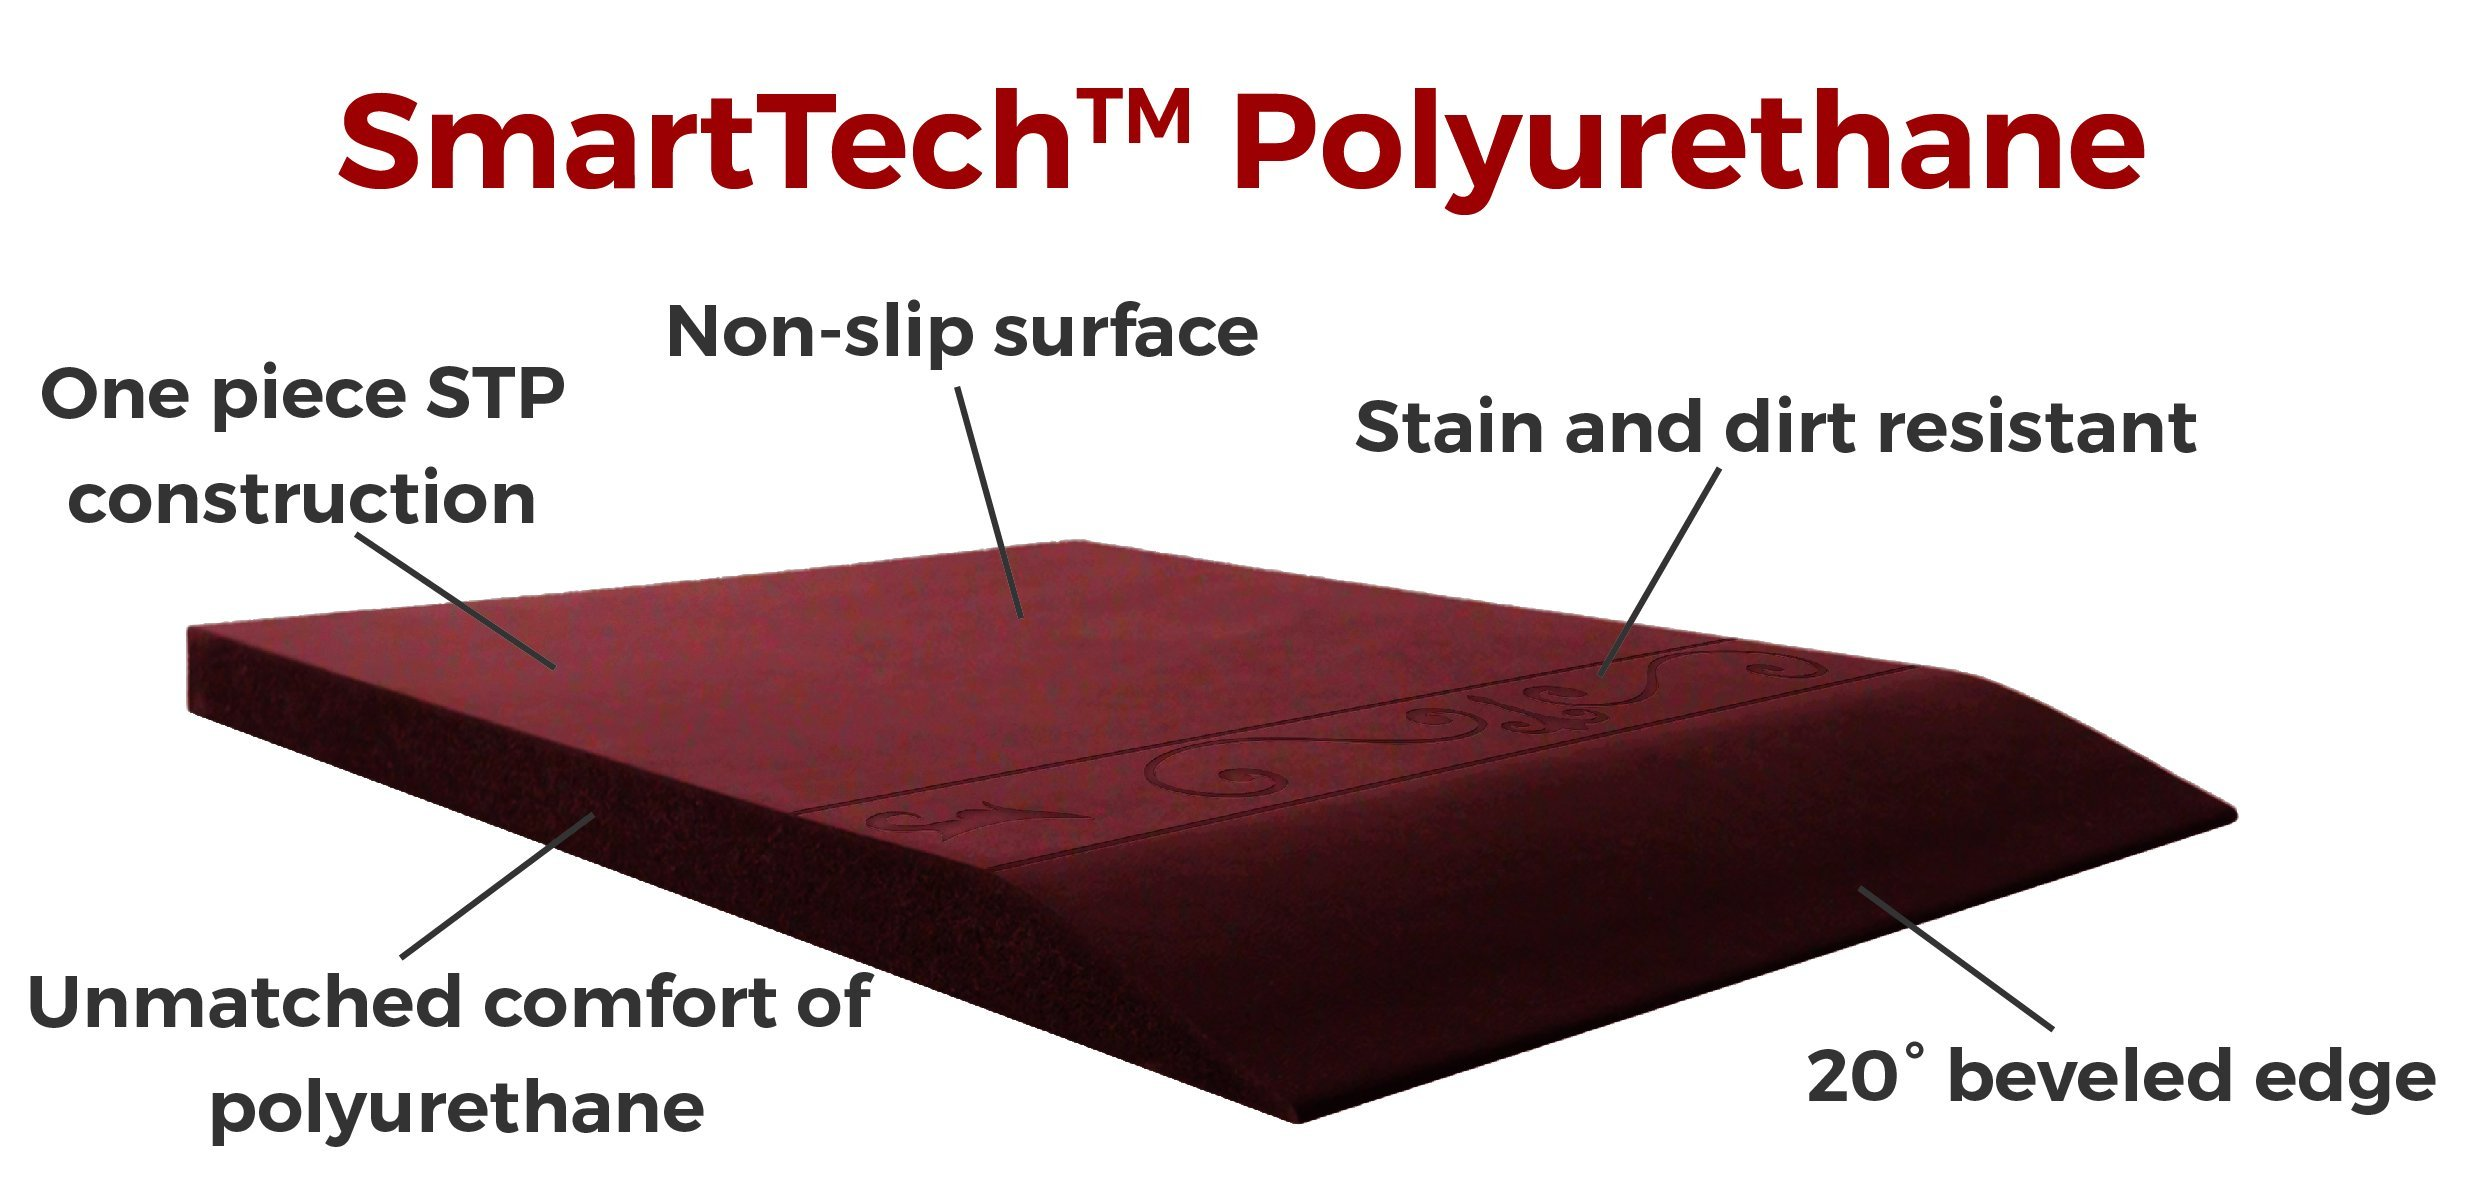 WellnessMats Anti-Fatigue 36 Inch by 24 Inch Granite Motif Kitchen Mat, Copper by WellnessMats (Image #4)